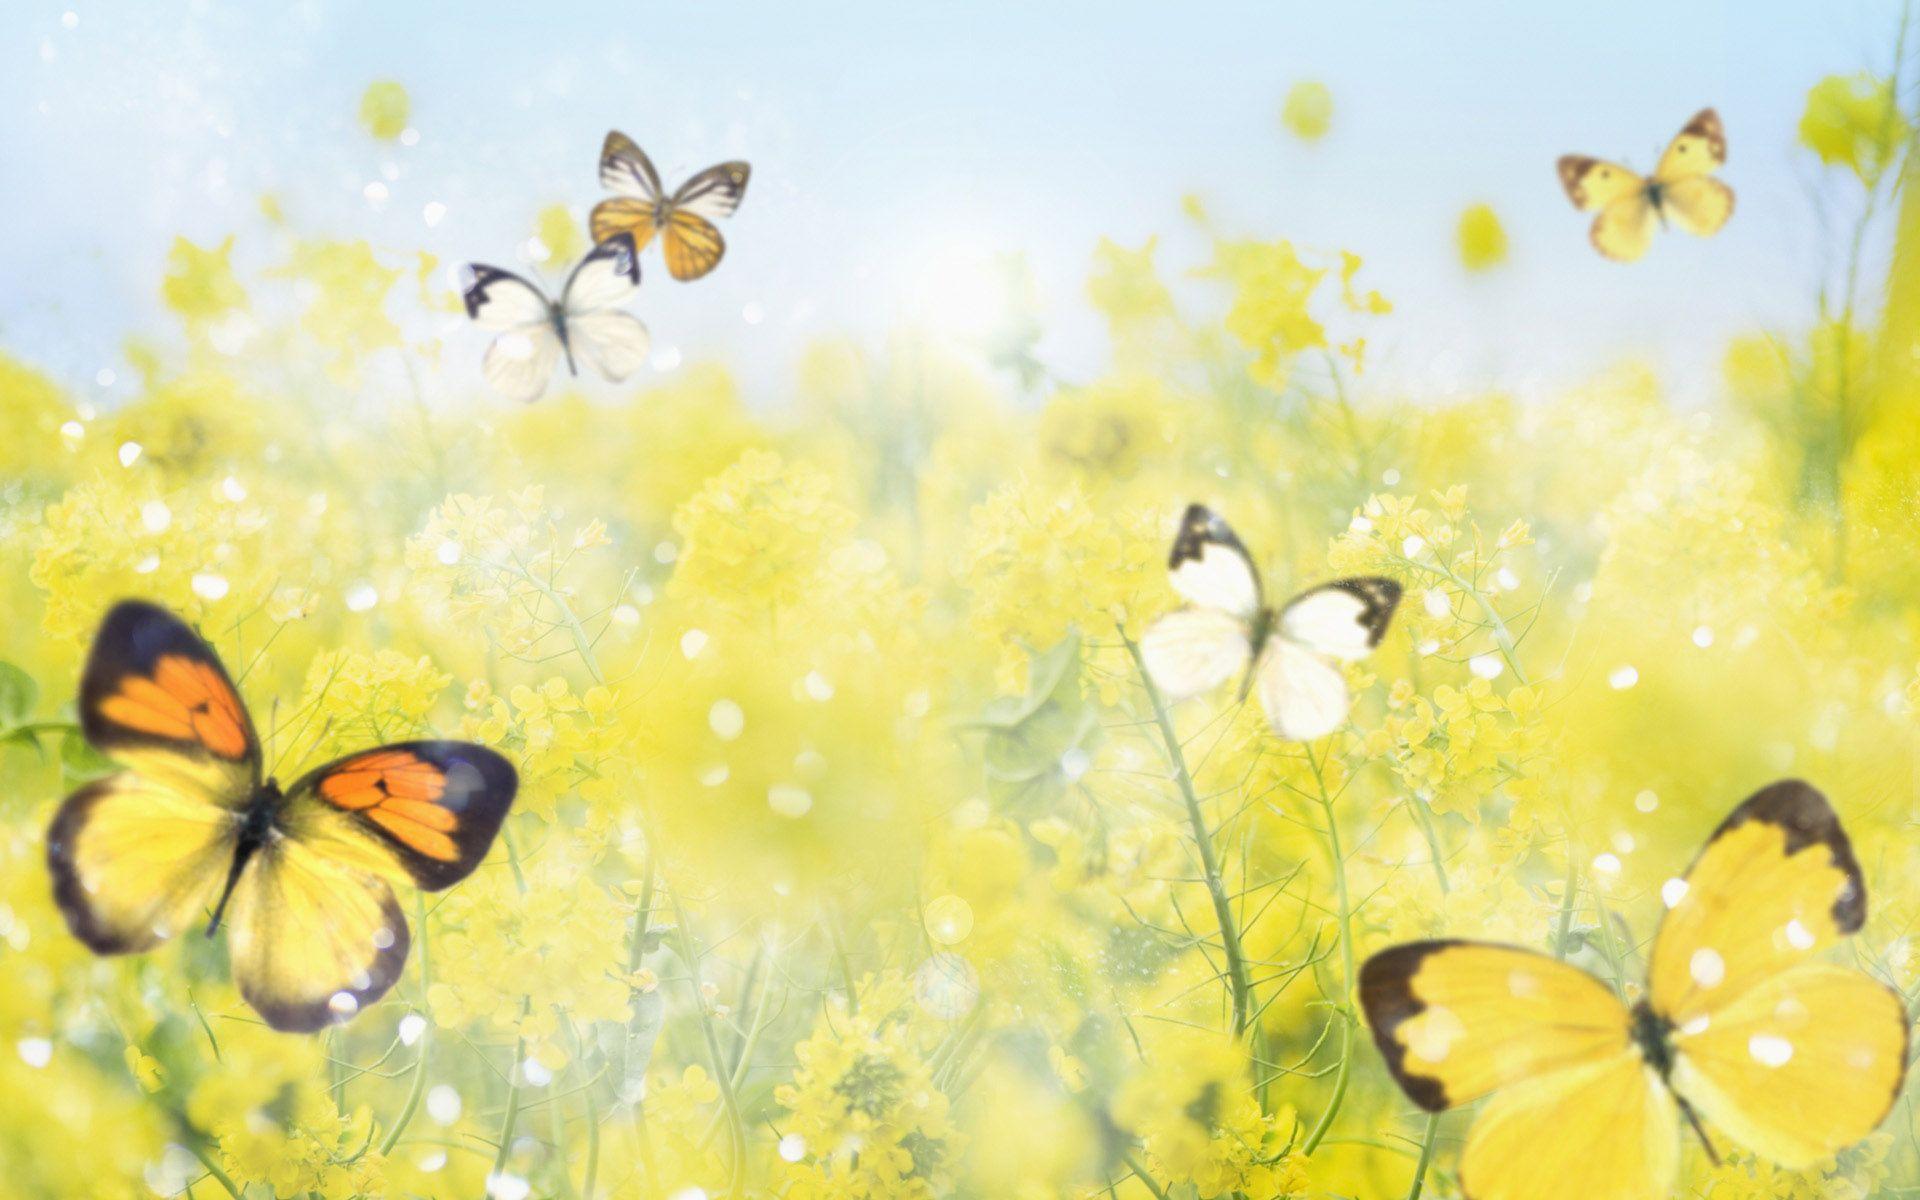 Top Wallpaper Butterfly Spring - 4da89d6ec60c8a5f09c0cfebb7fae7be  Pictures_479484.jpg